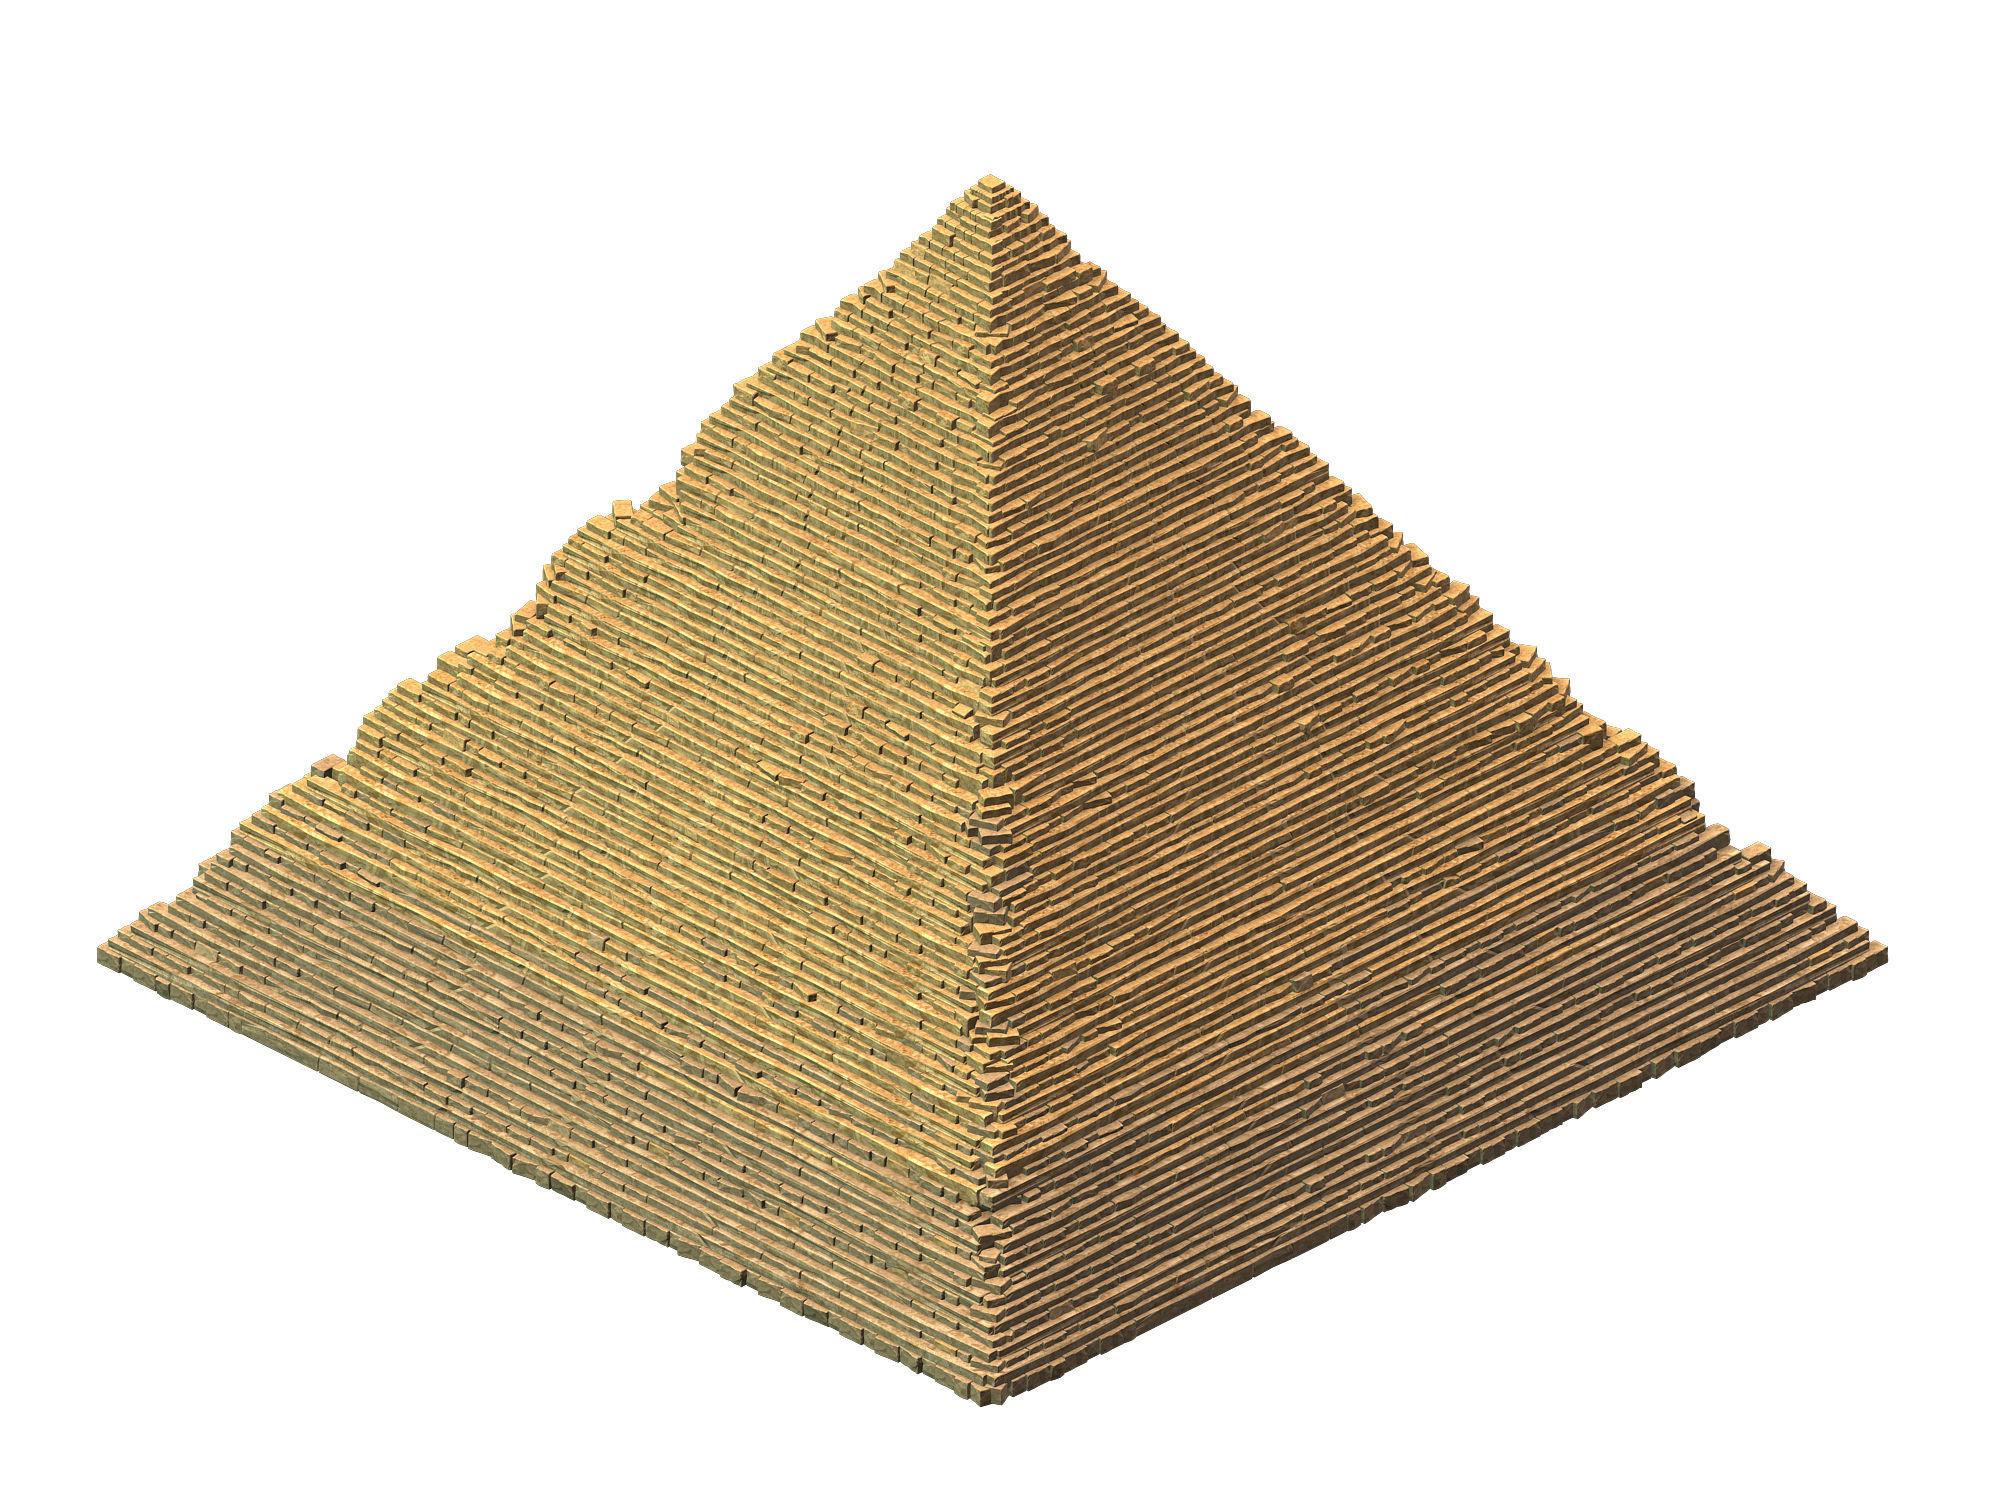 Giza - Three Pyramids 01